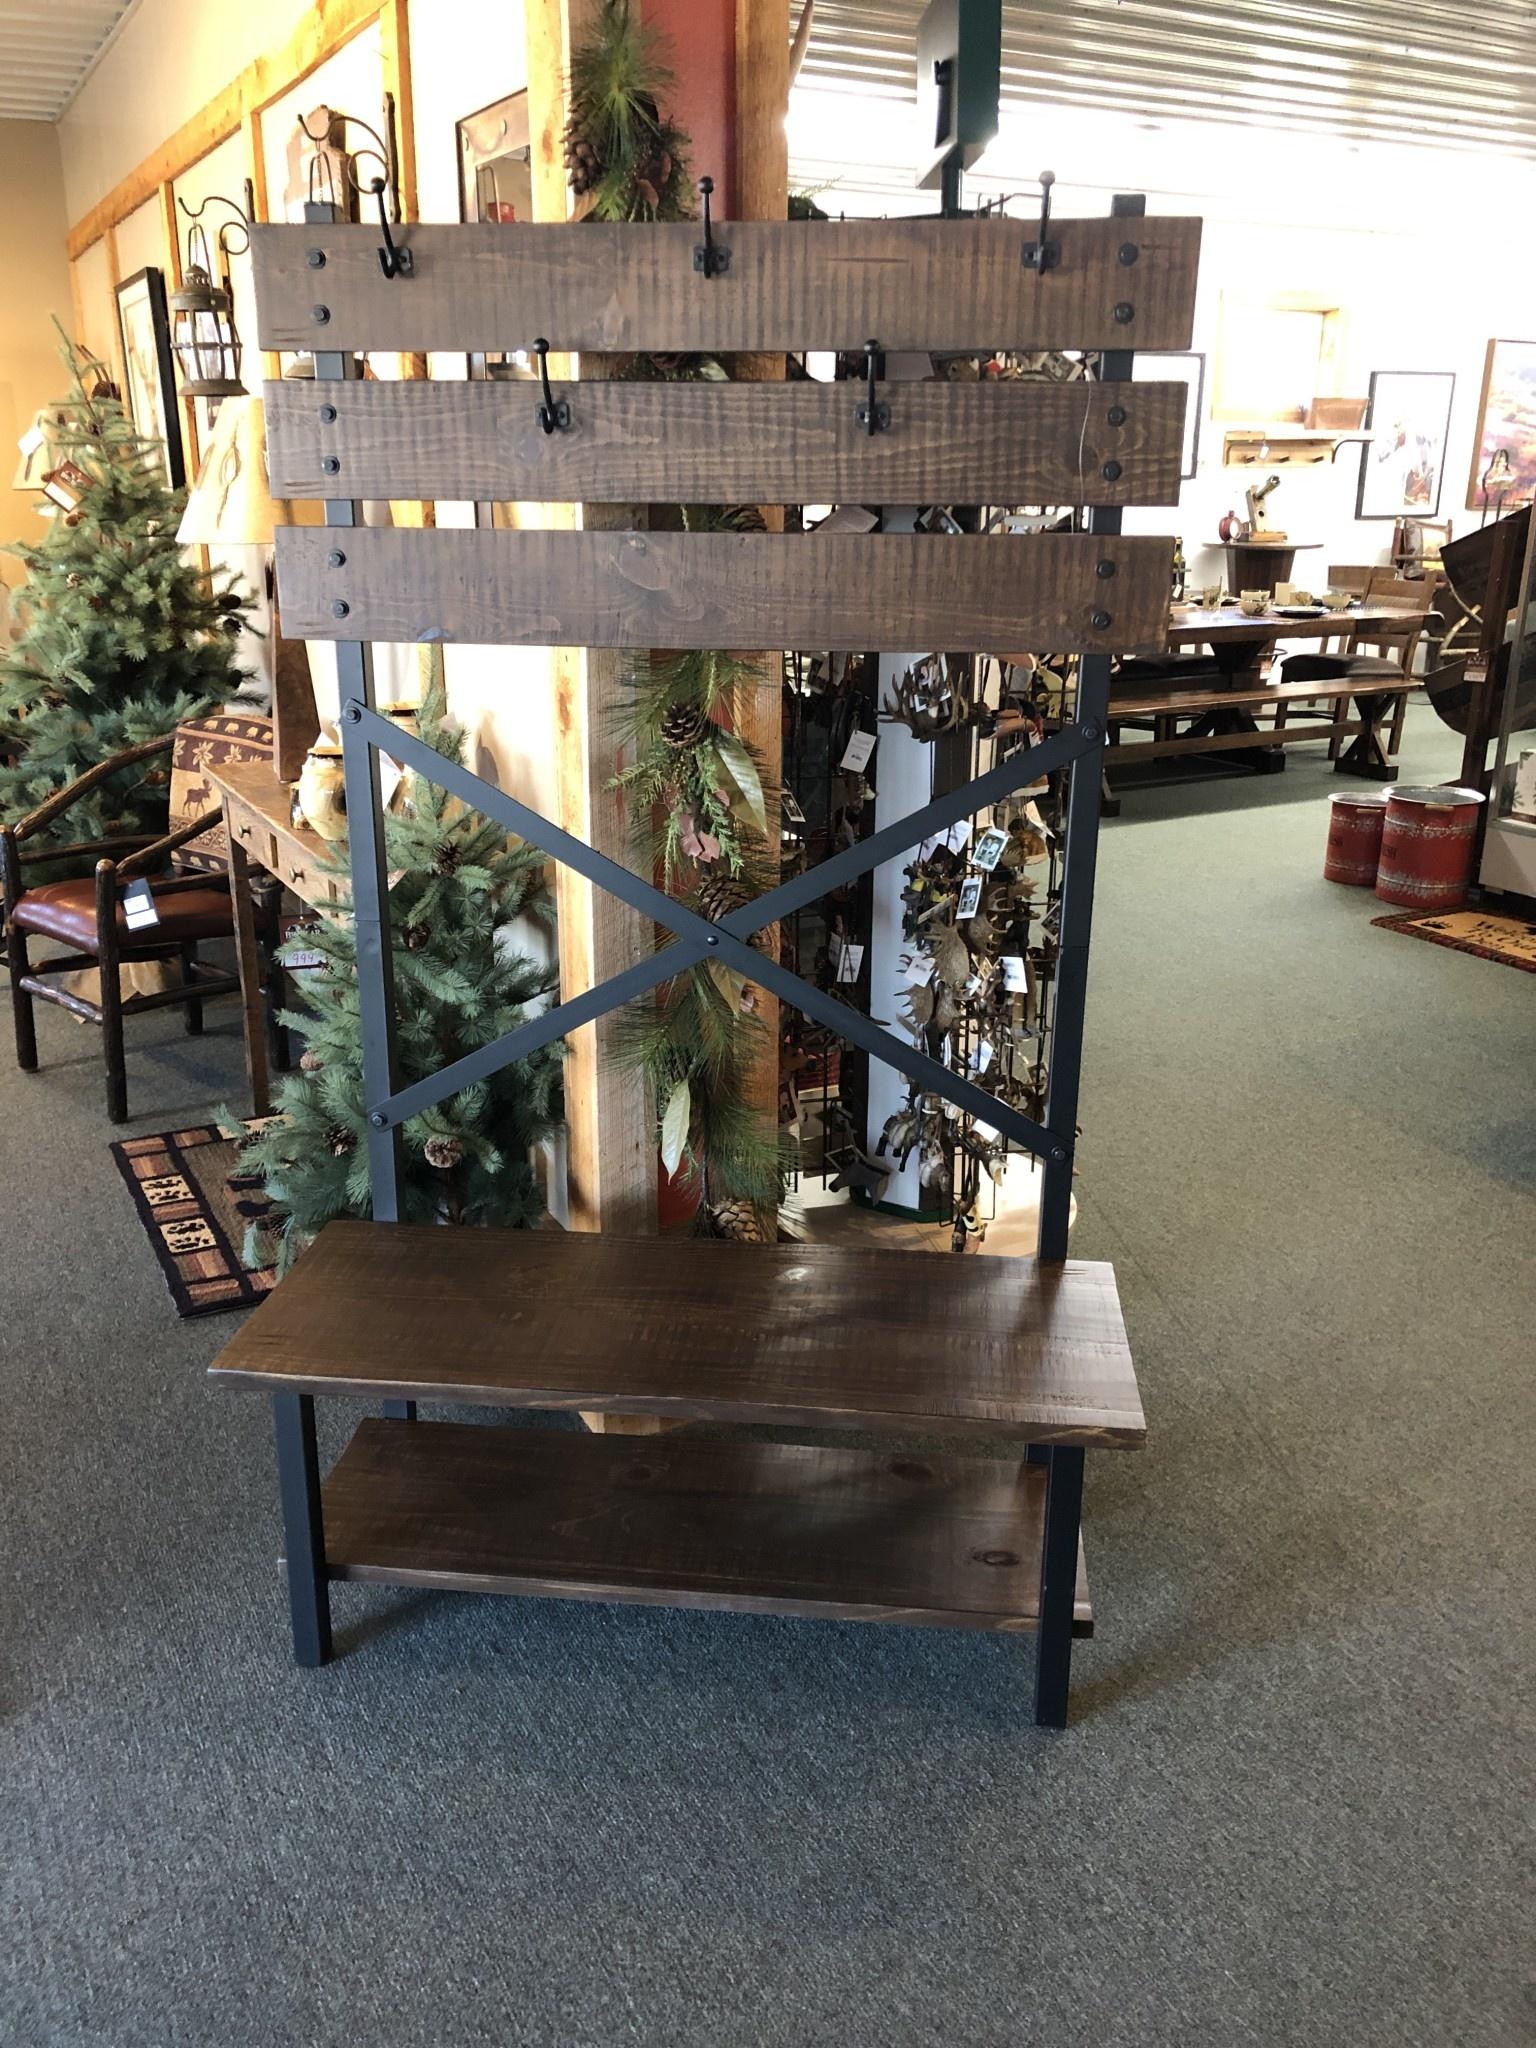 IFD 359 Pueblo Hall Tree 43.25x18x70